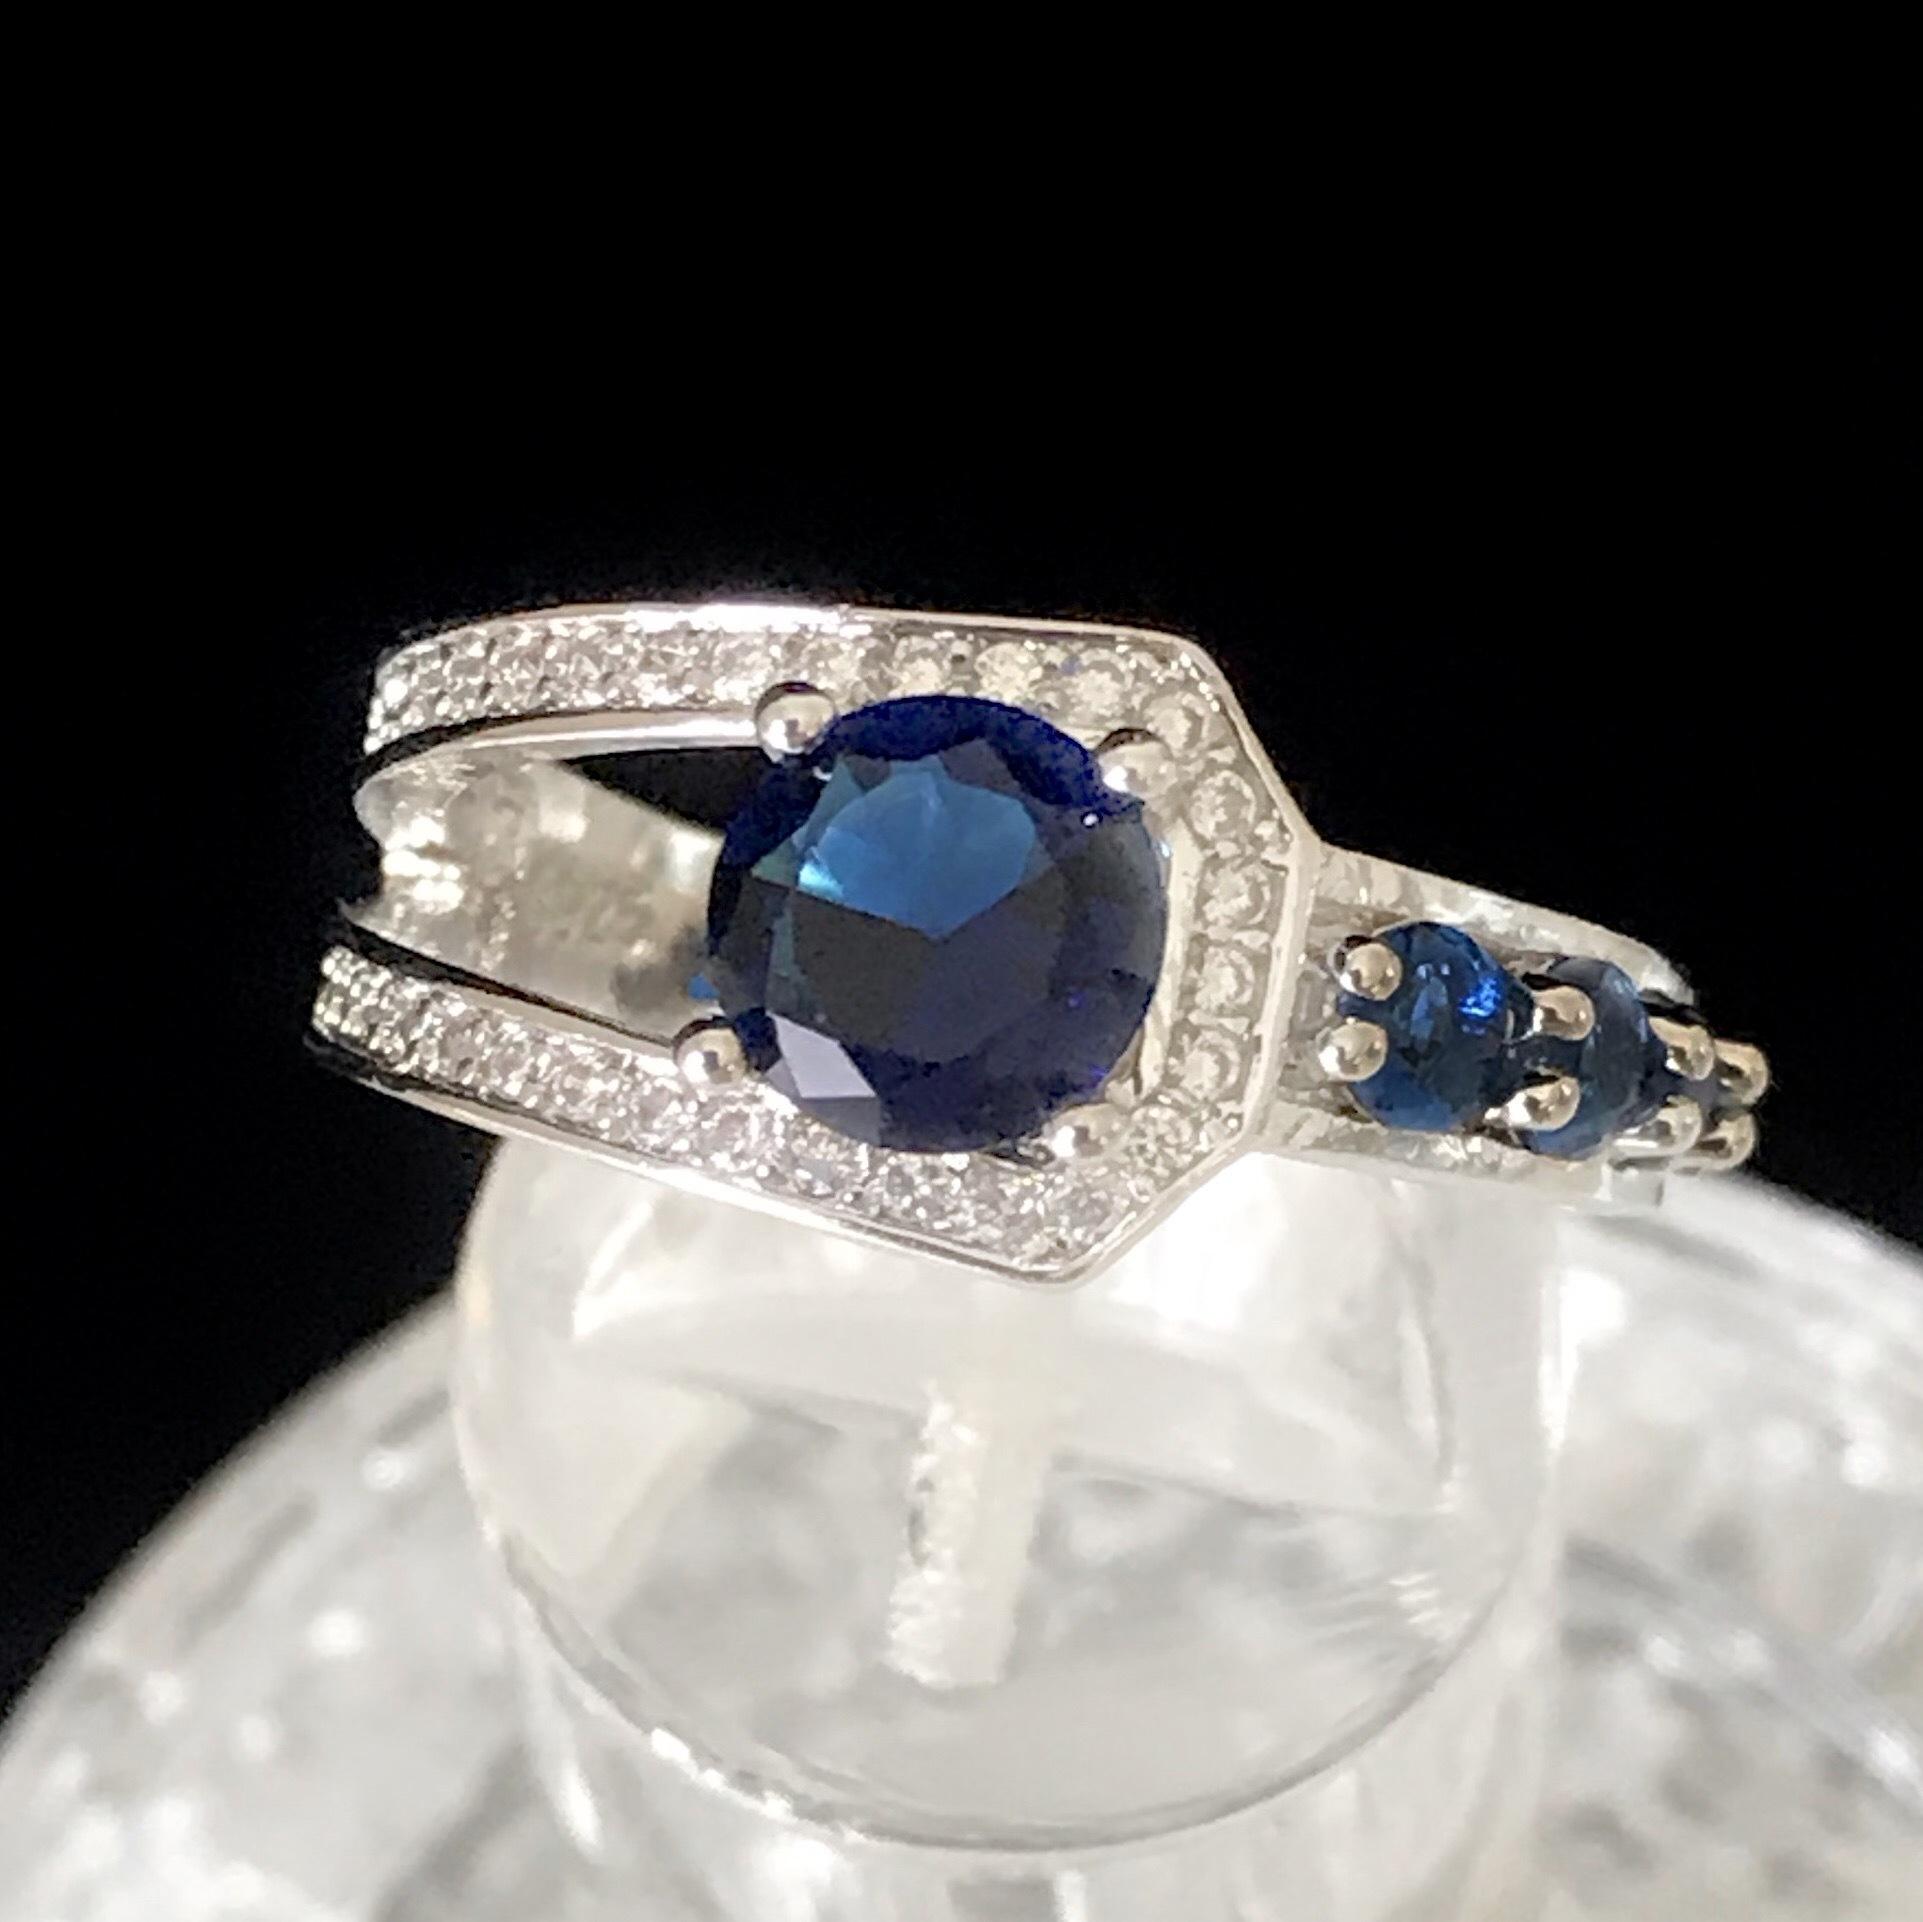 D052A アシンメトリ サファイア ブルー シルバー リング レディース 指輪